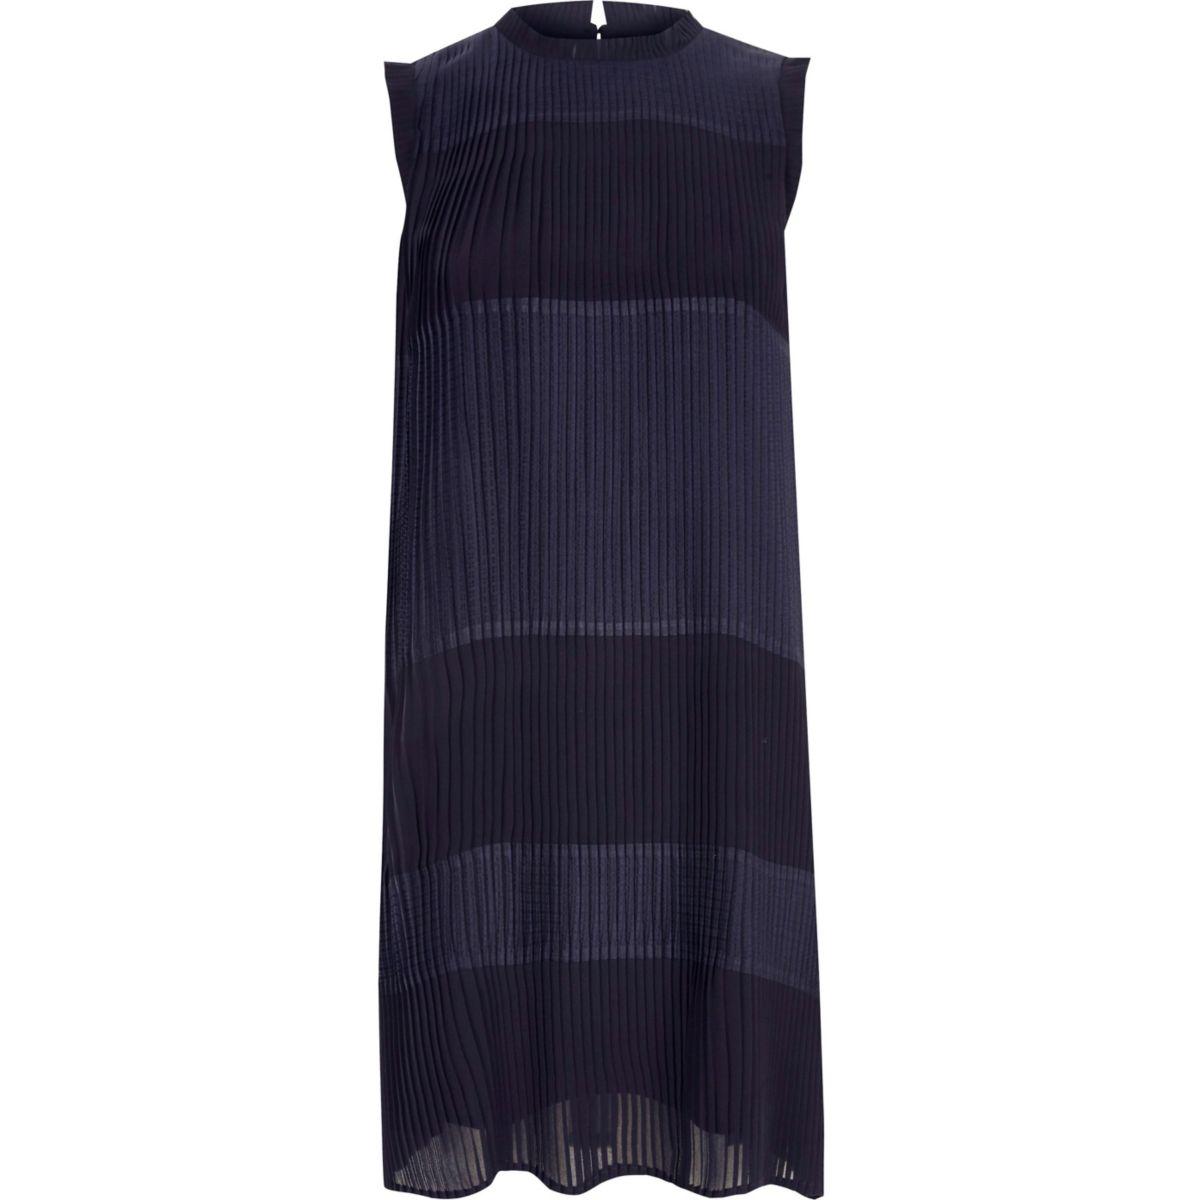 Navy sleeveless pleated swing dress